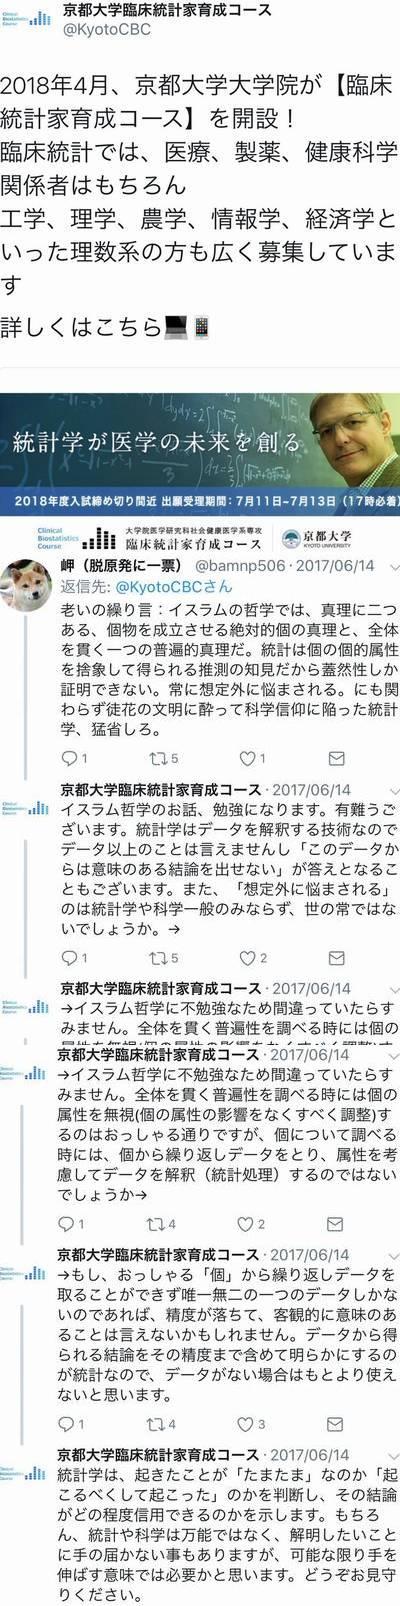 京大大学院 脱原発 オーバーキル